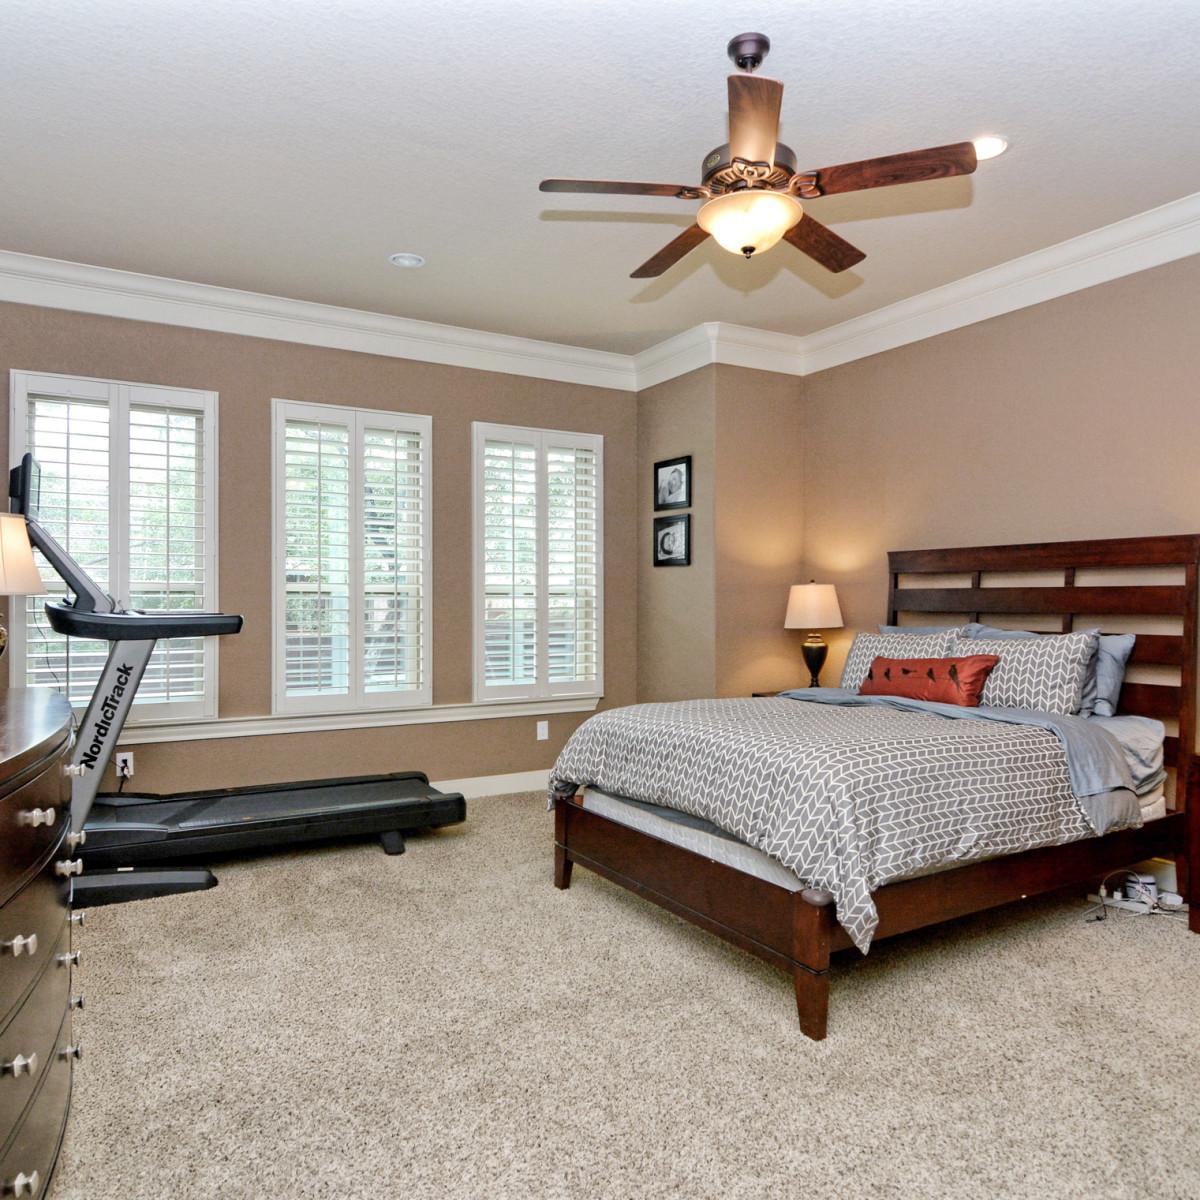 24323 Arboles Verdes San Antonio house for sale bedroom